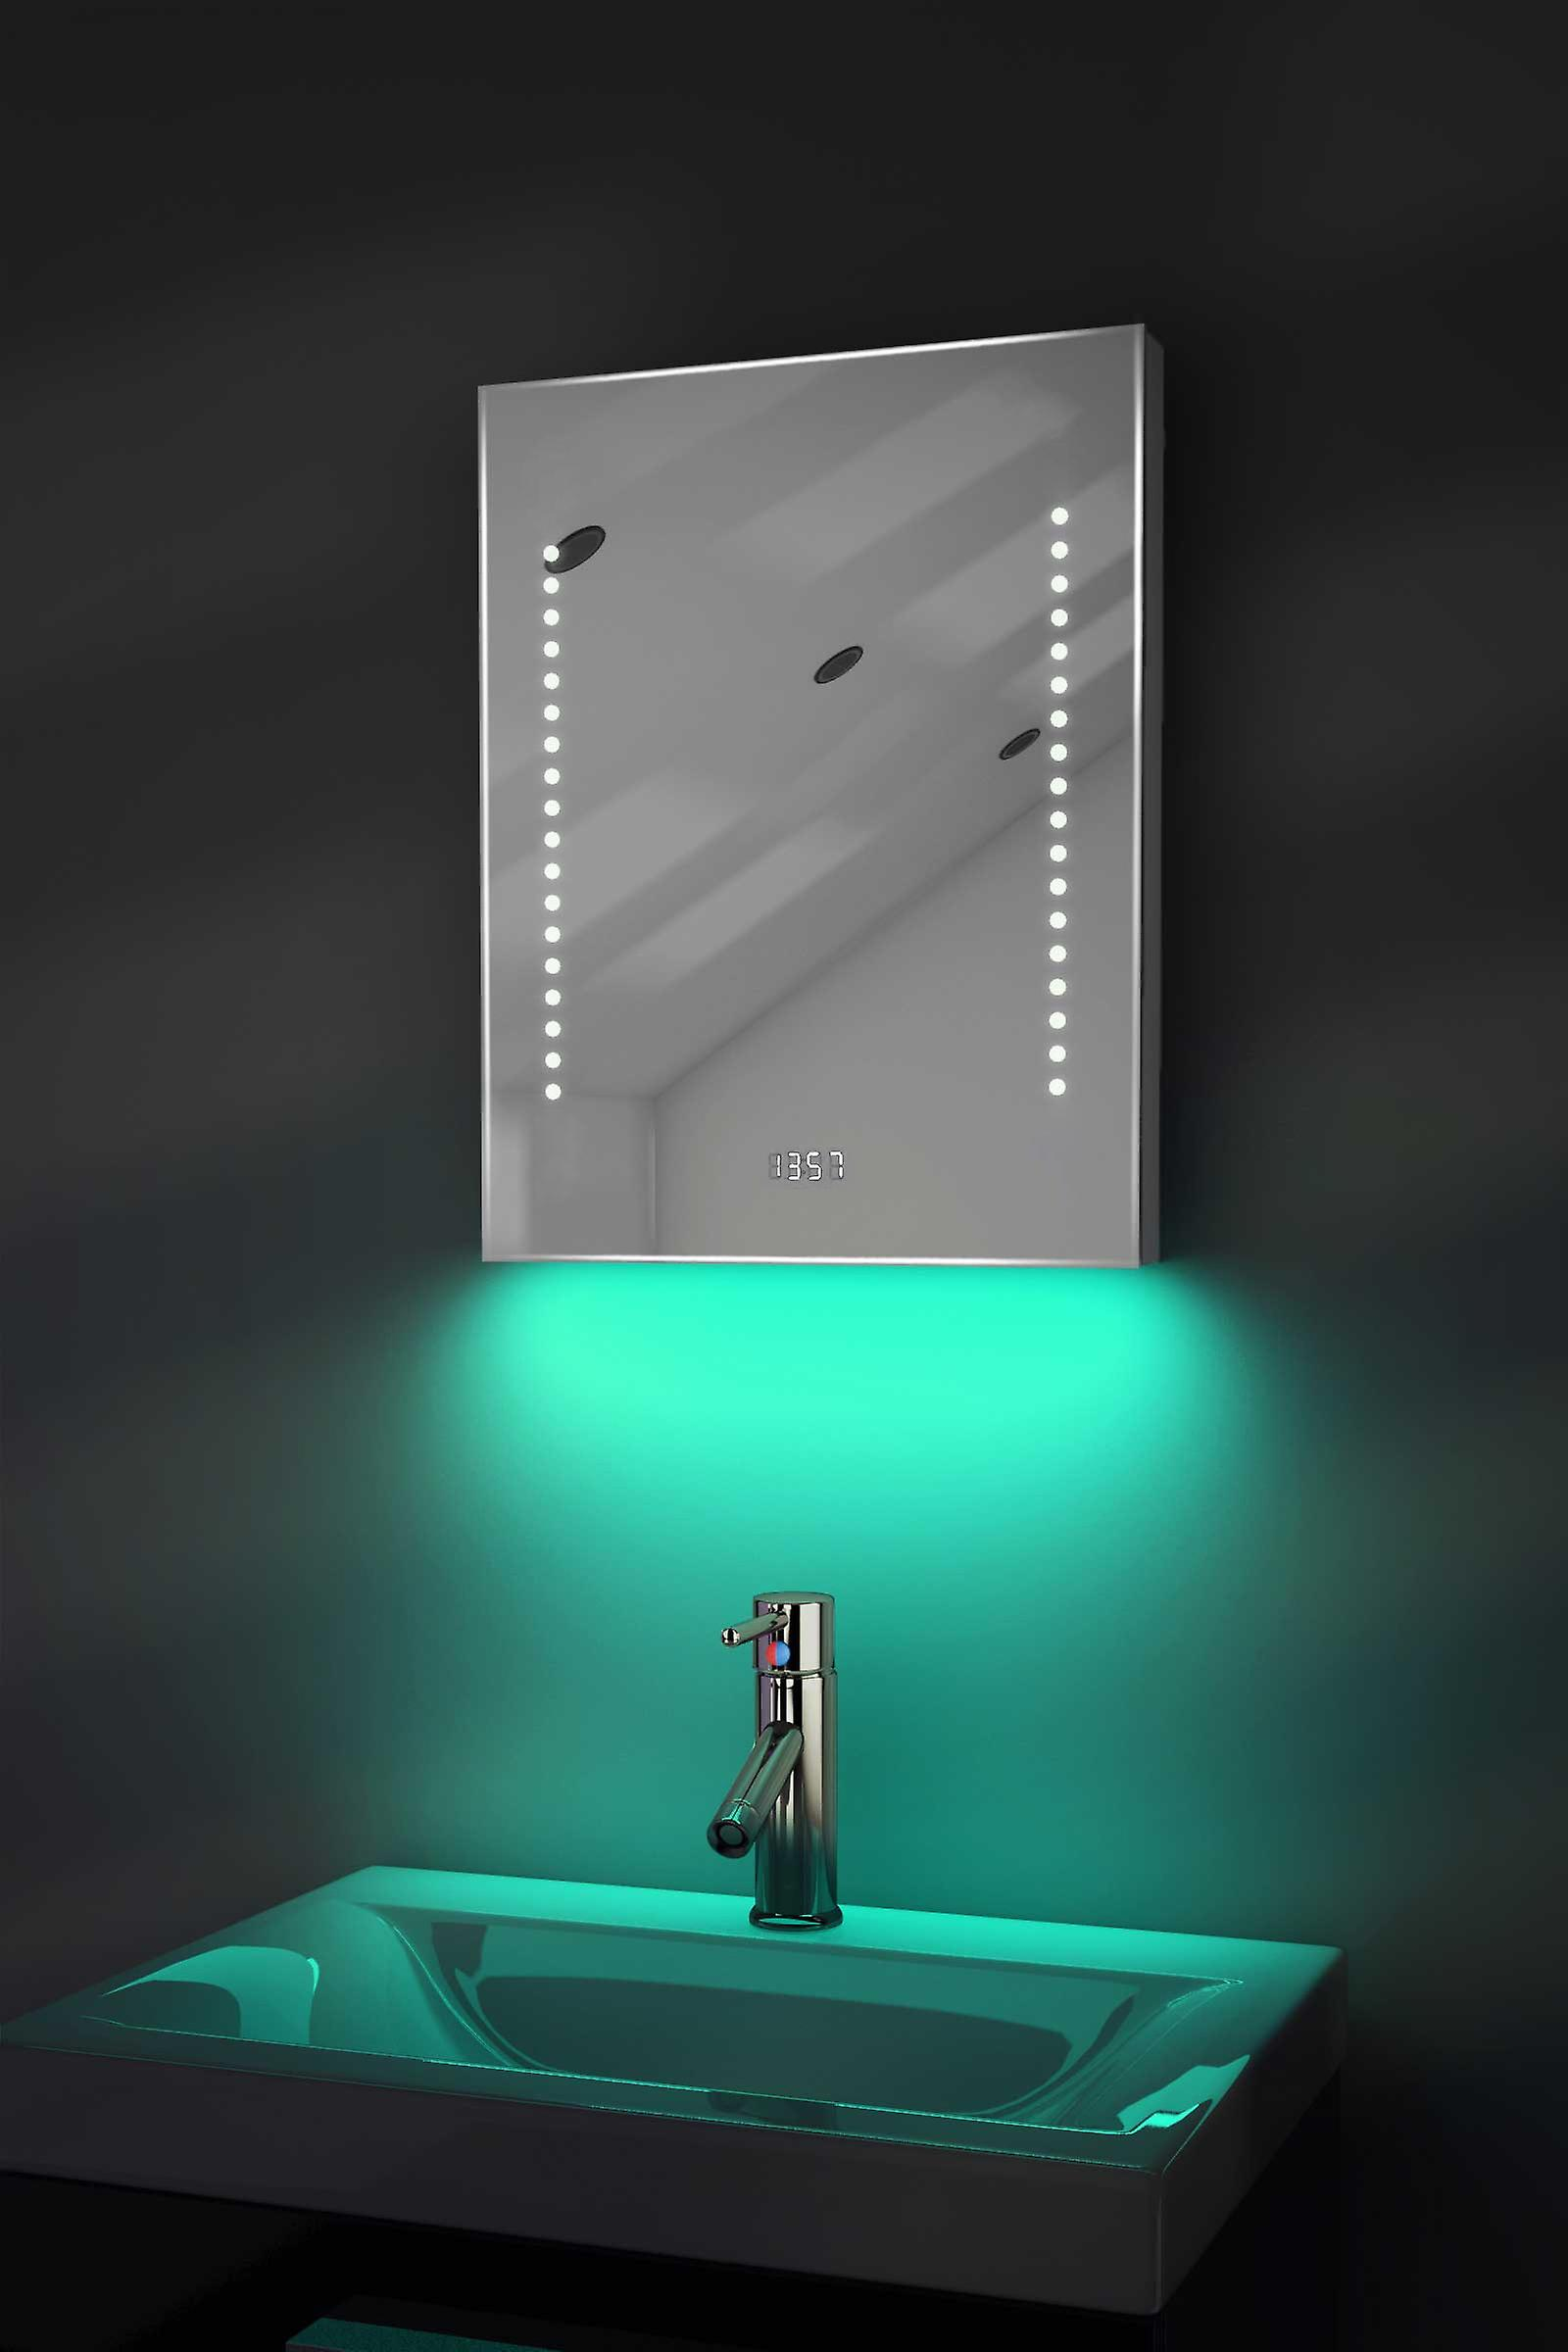 Digital Clock Slim Mirror with Under Lighting, Demist & Sensor k188w